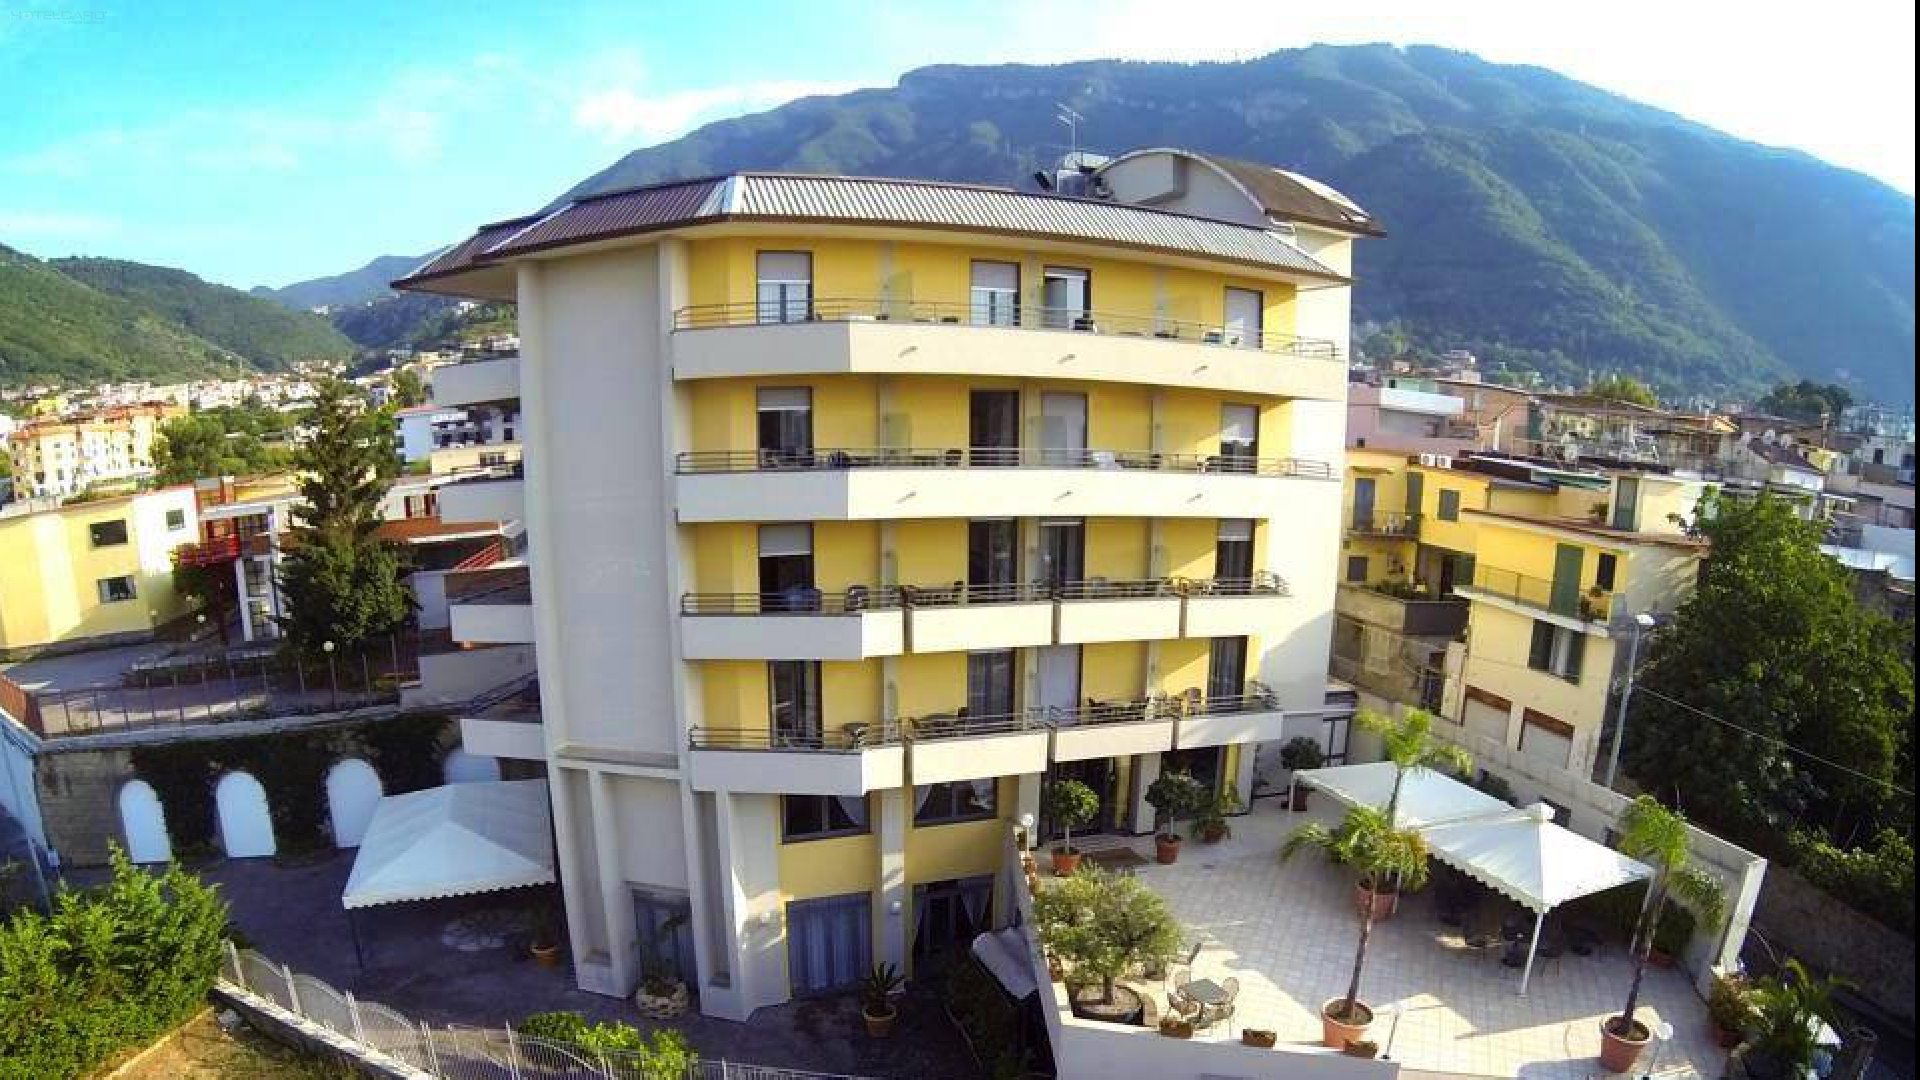 Europa Stabia Hotel 2